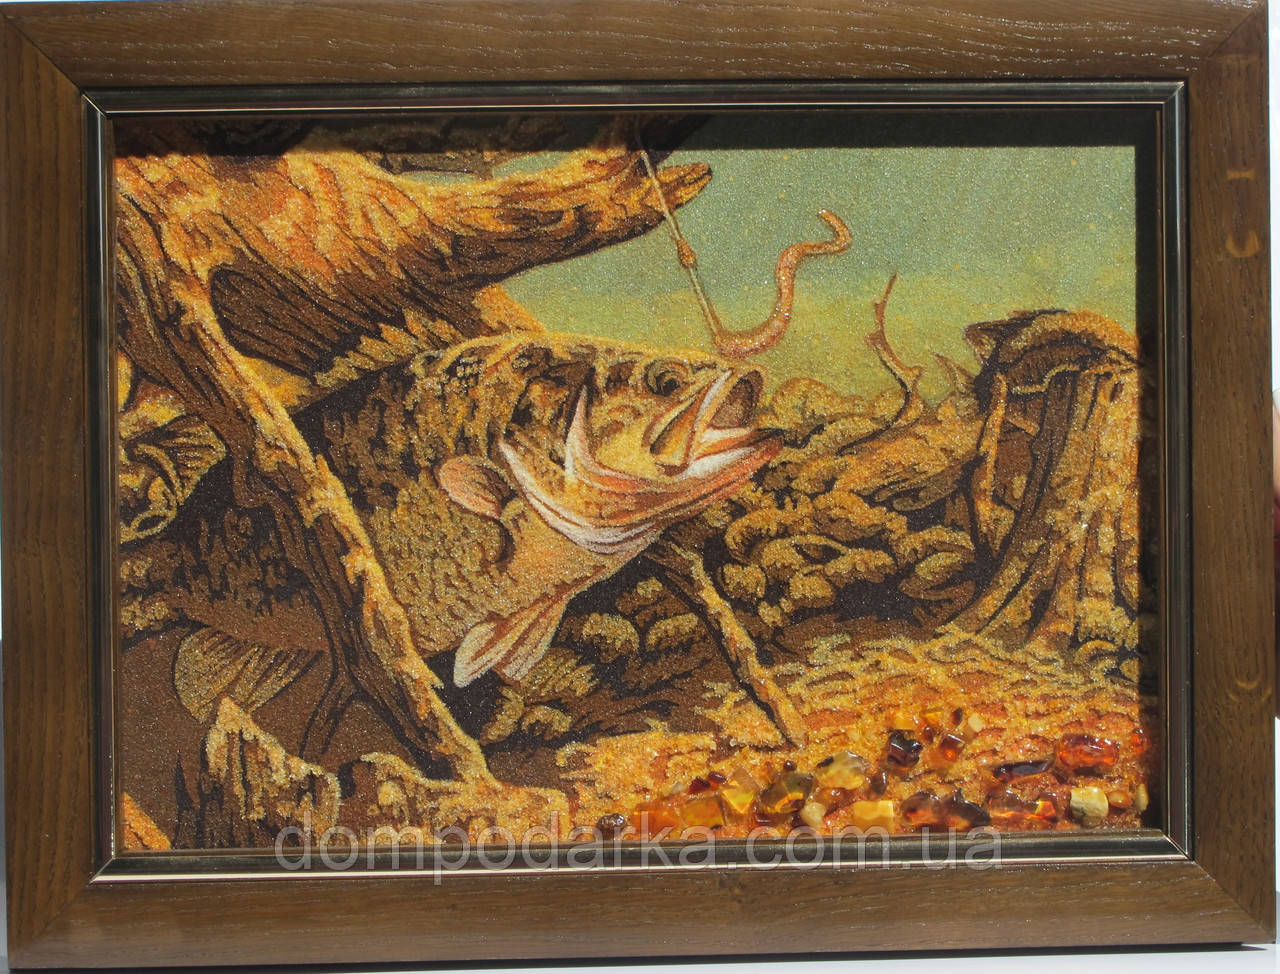 "Картина из янтарной крошки ""Рыба и червяк"" 20х30 см"